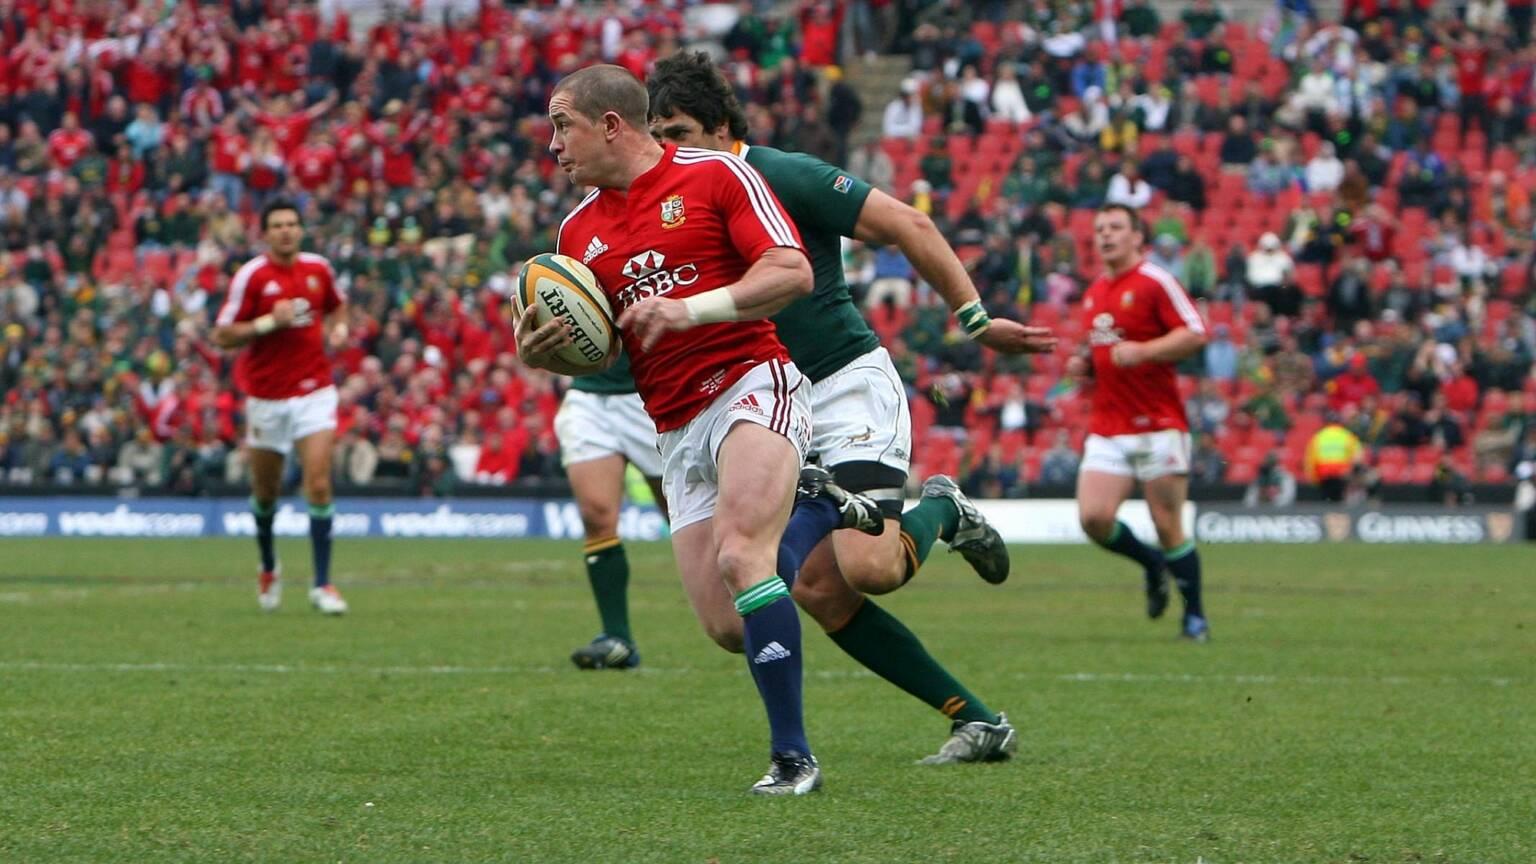 Shane Williams Playing For British And Irish Lions Tour 2009